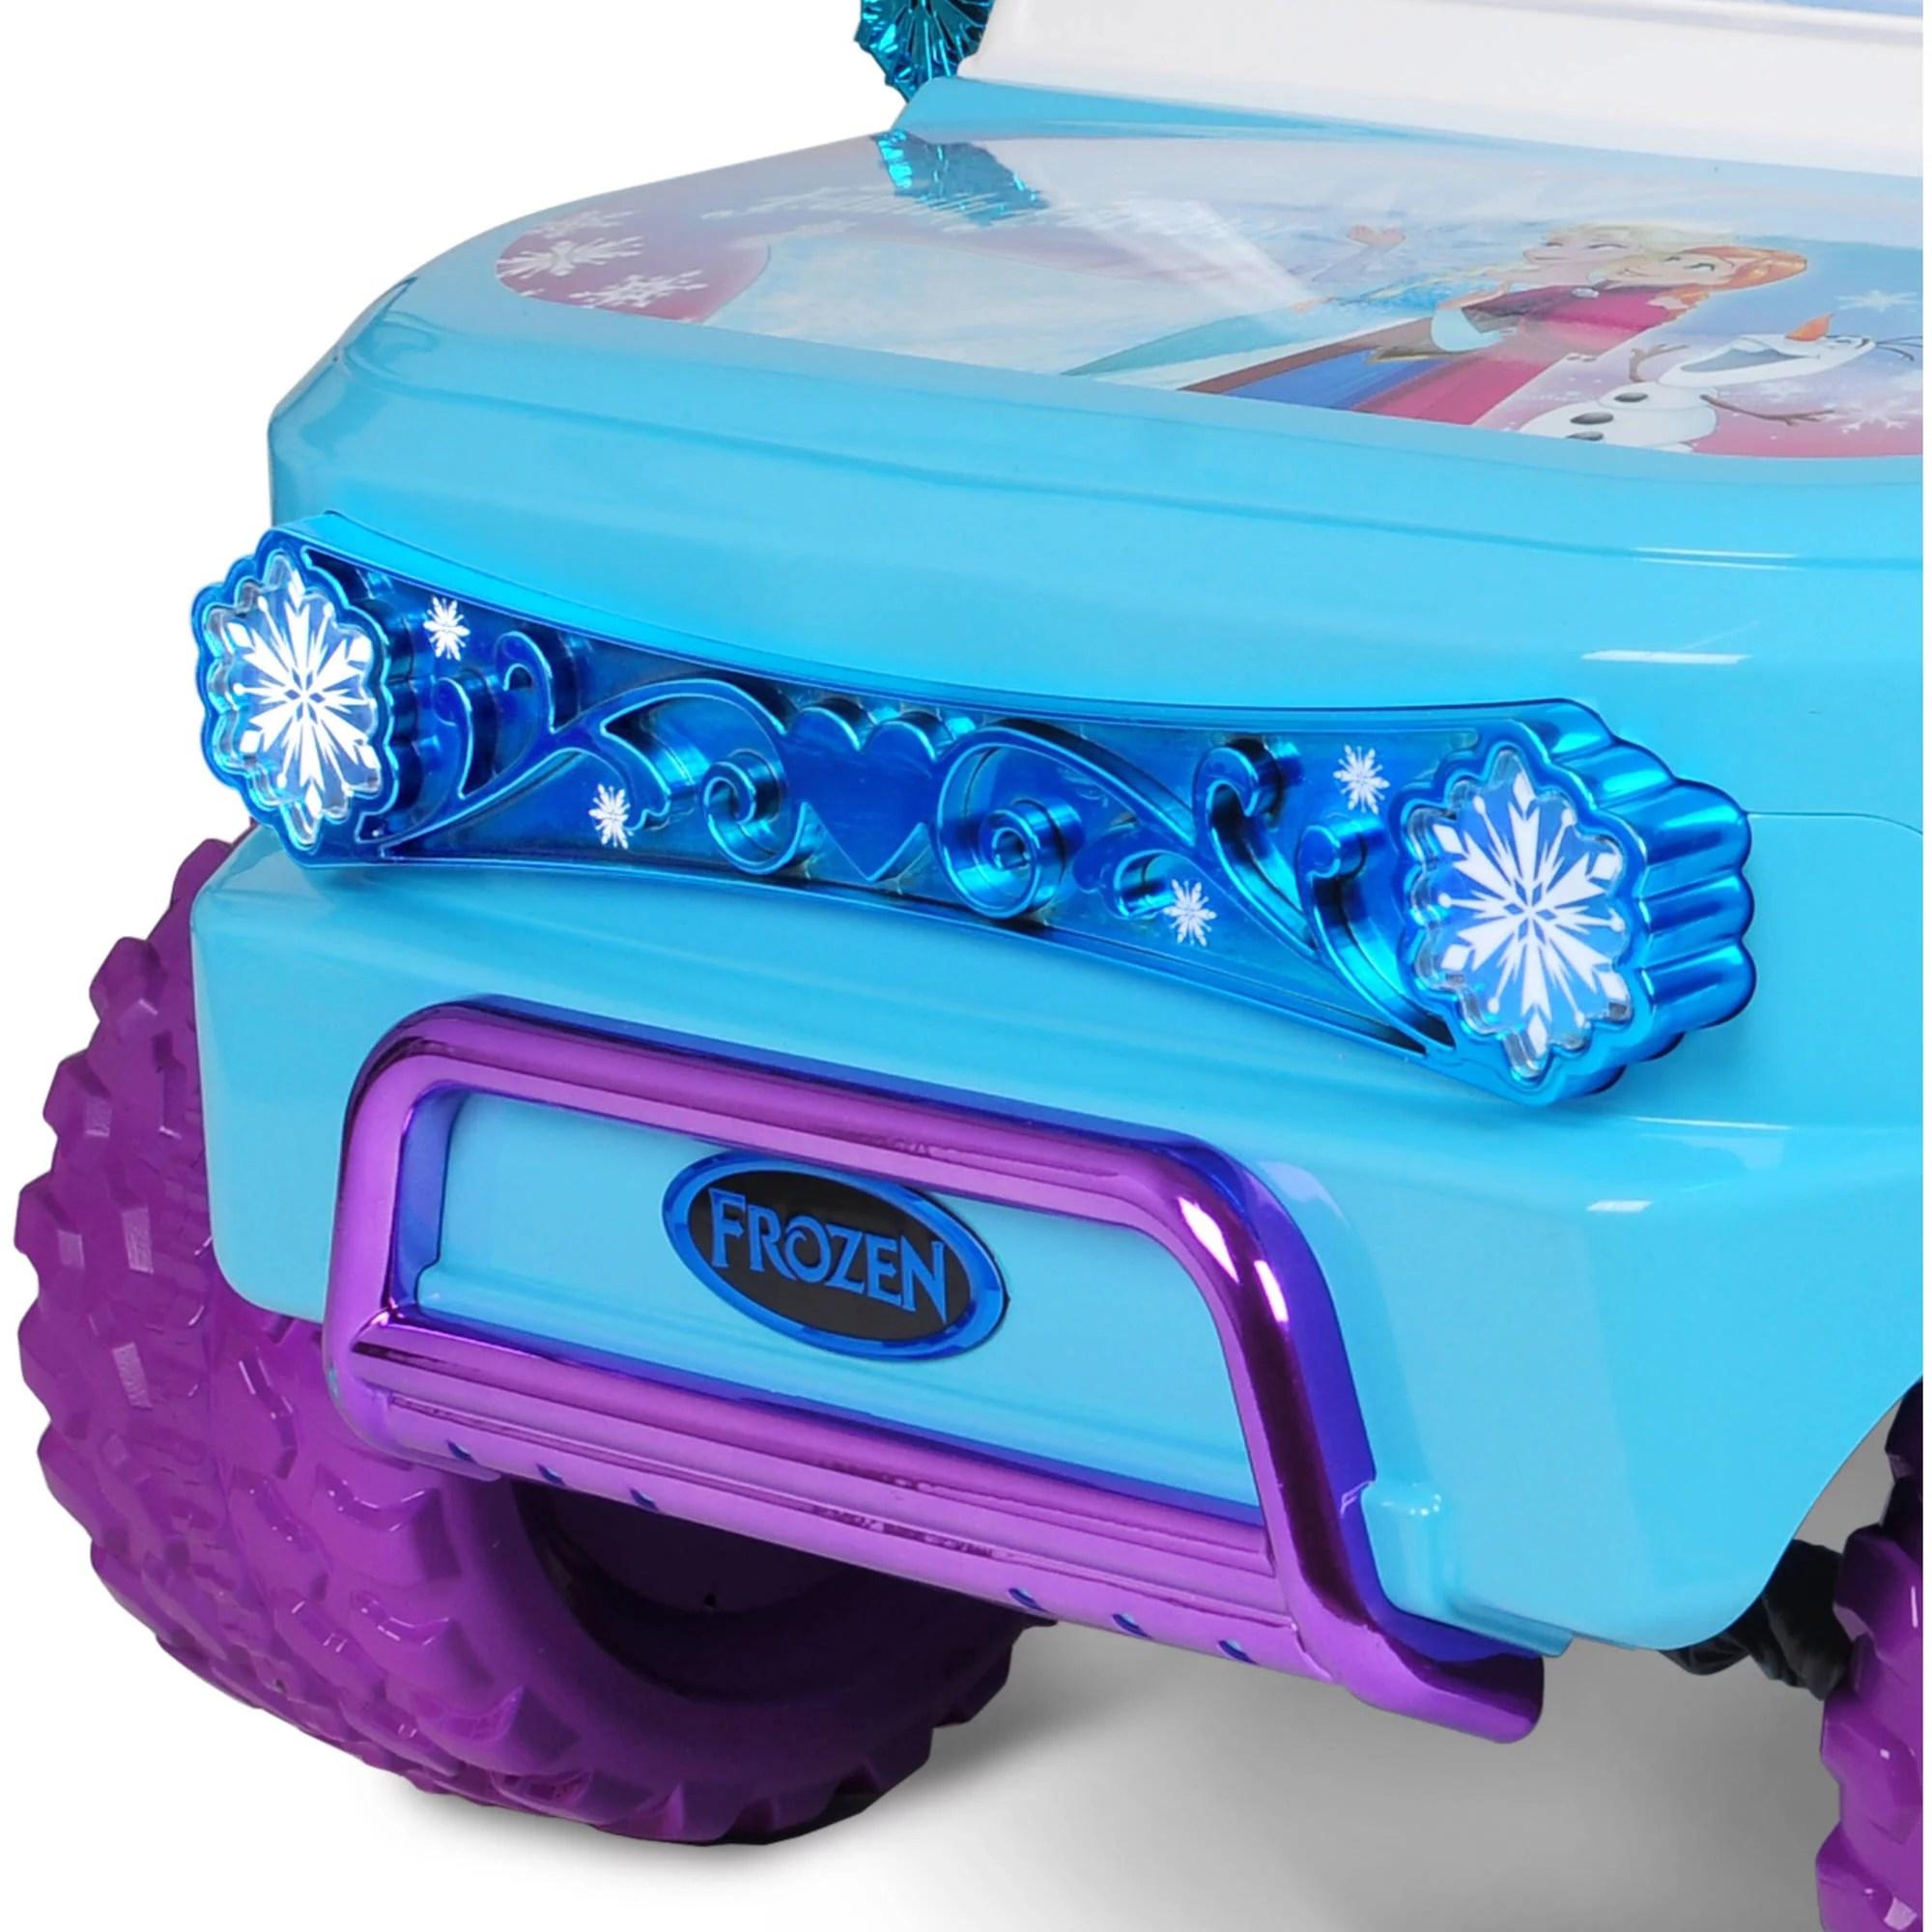 Disney Frozen SUV 12V Battery Operated Ride Walmart